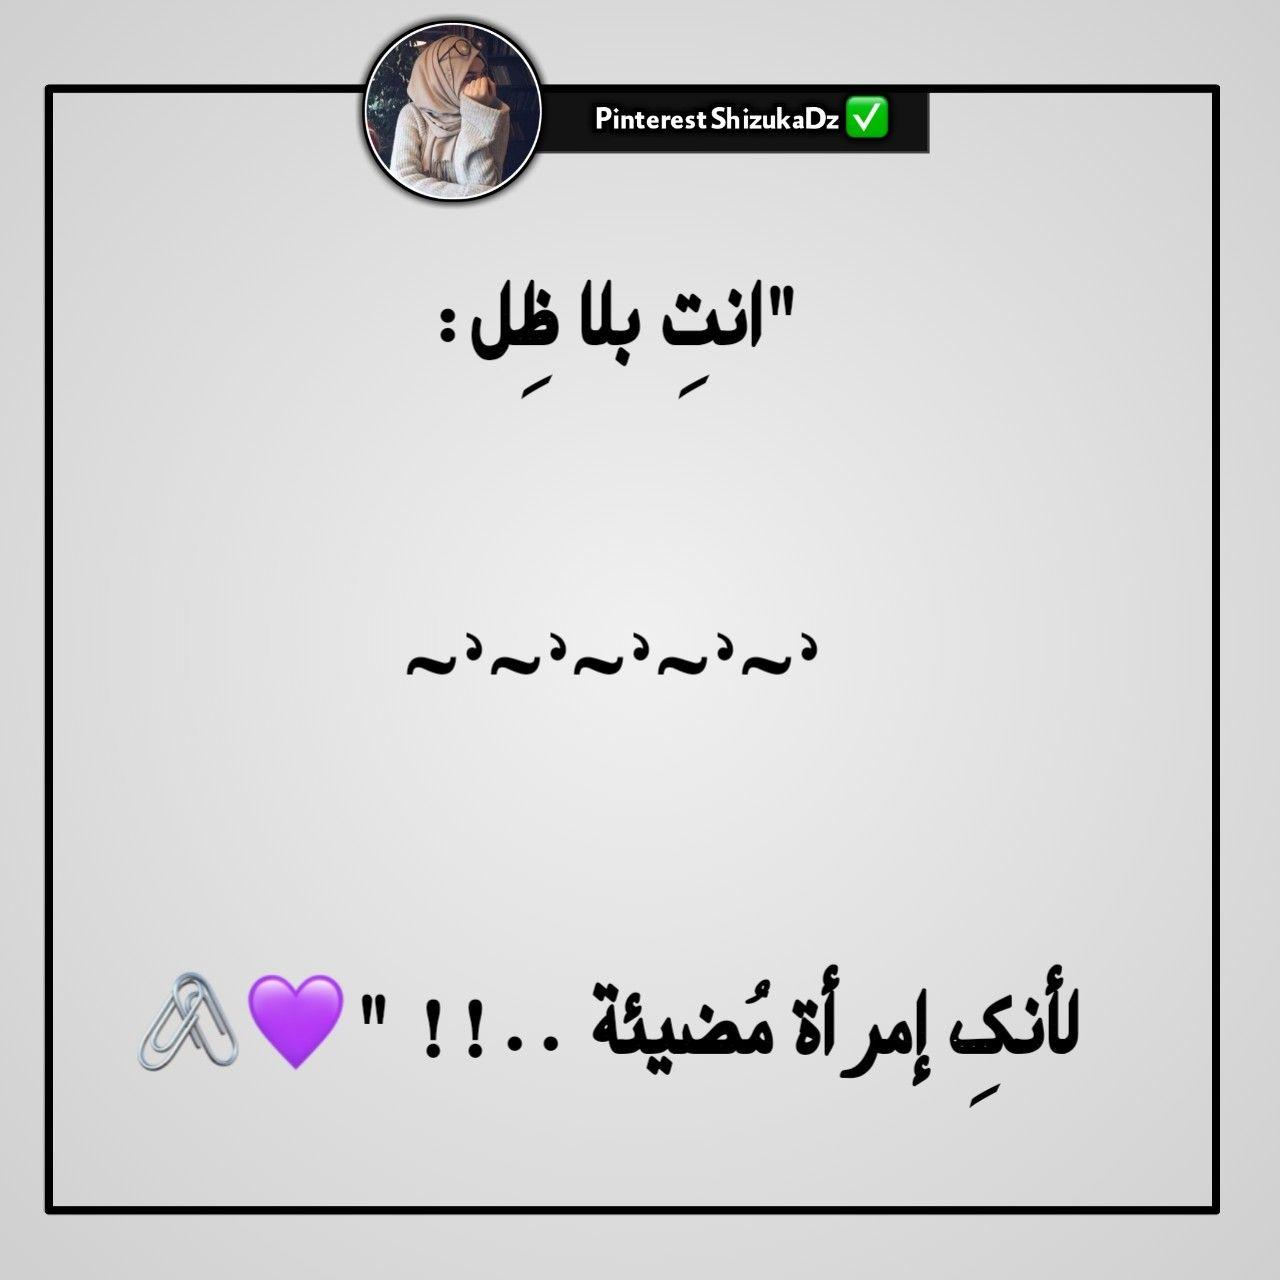 انت بلا ظ ل لأنك إمرأة م ضيئة Words Arabic Calligraphy Calligraphy